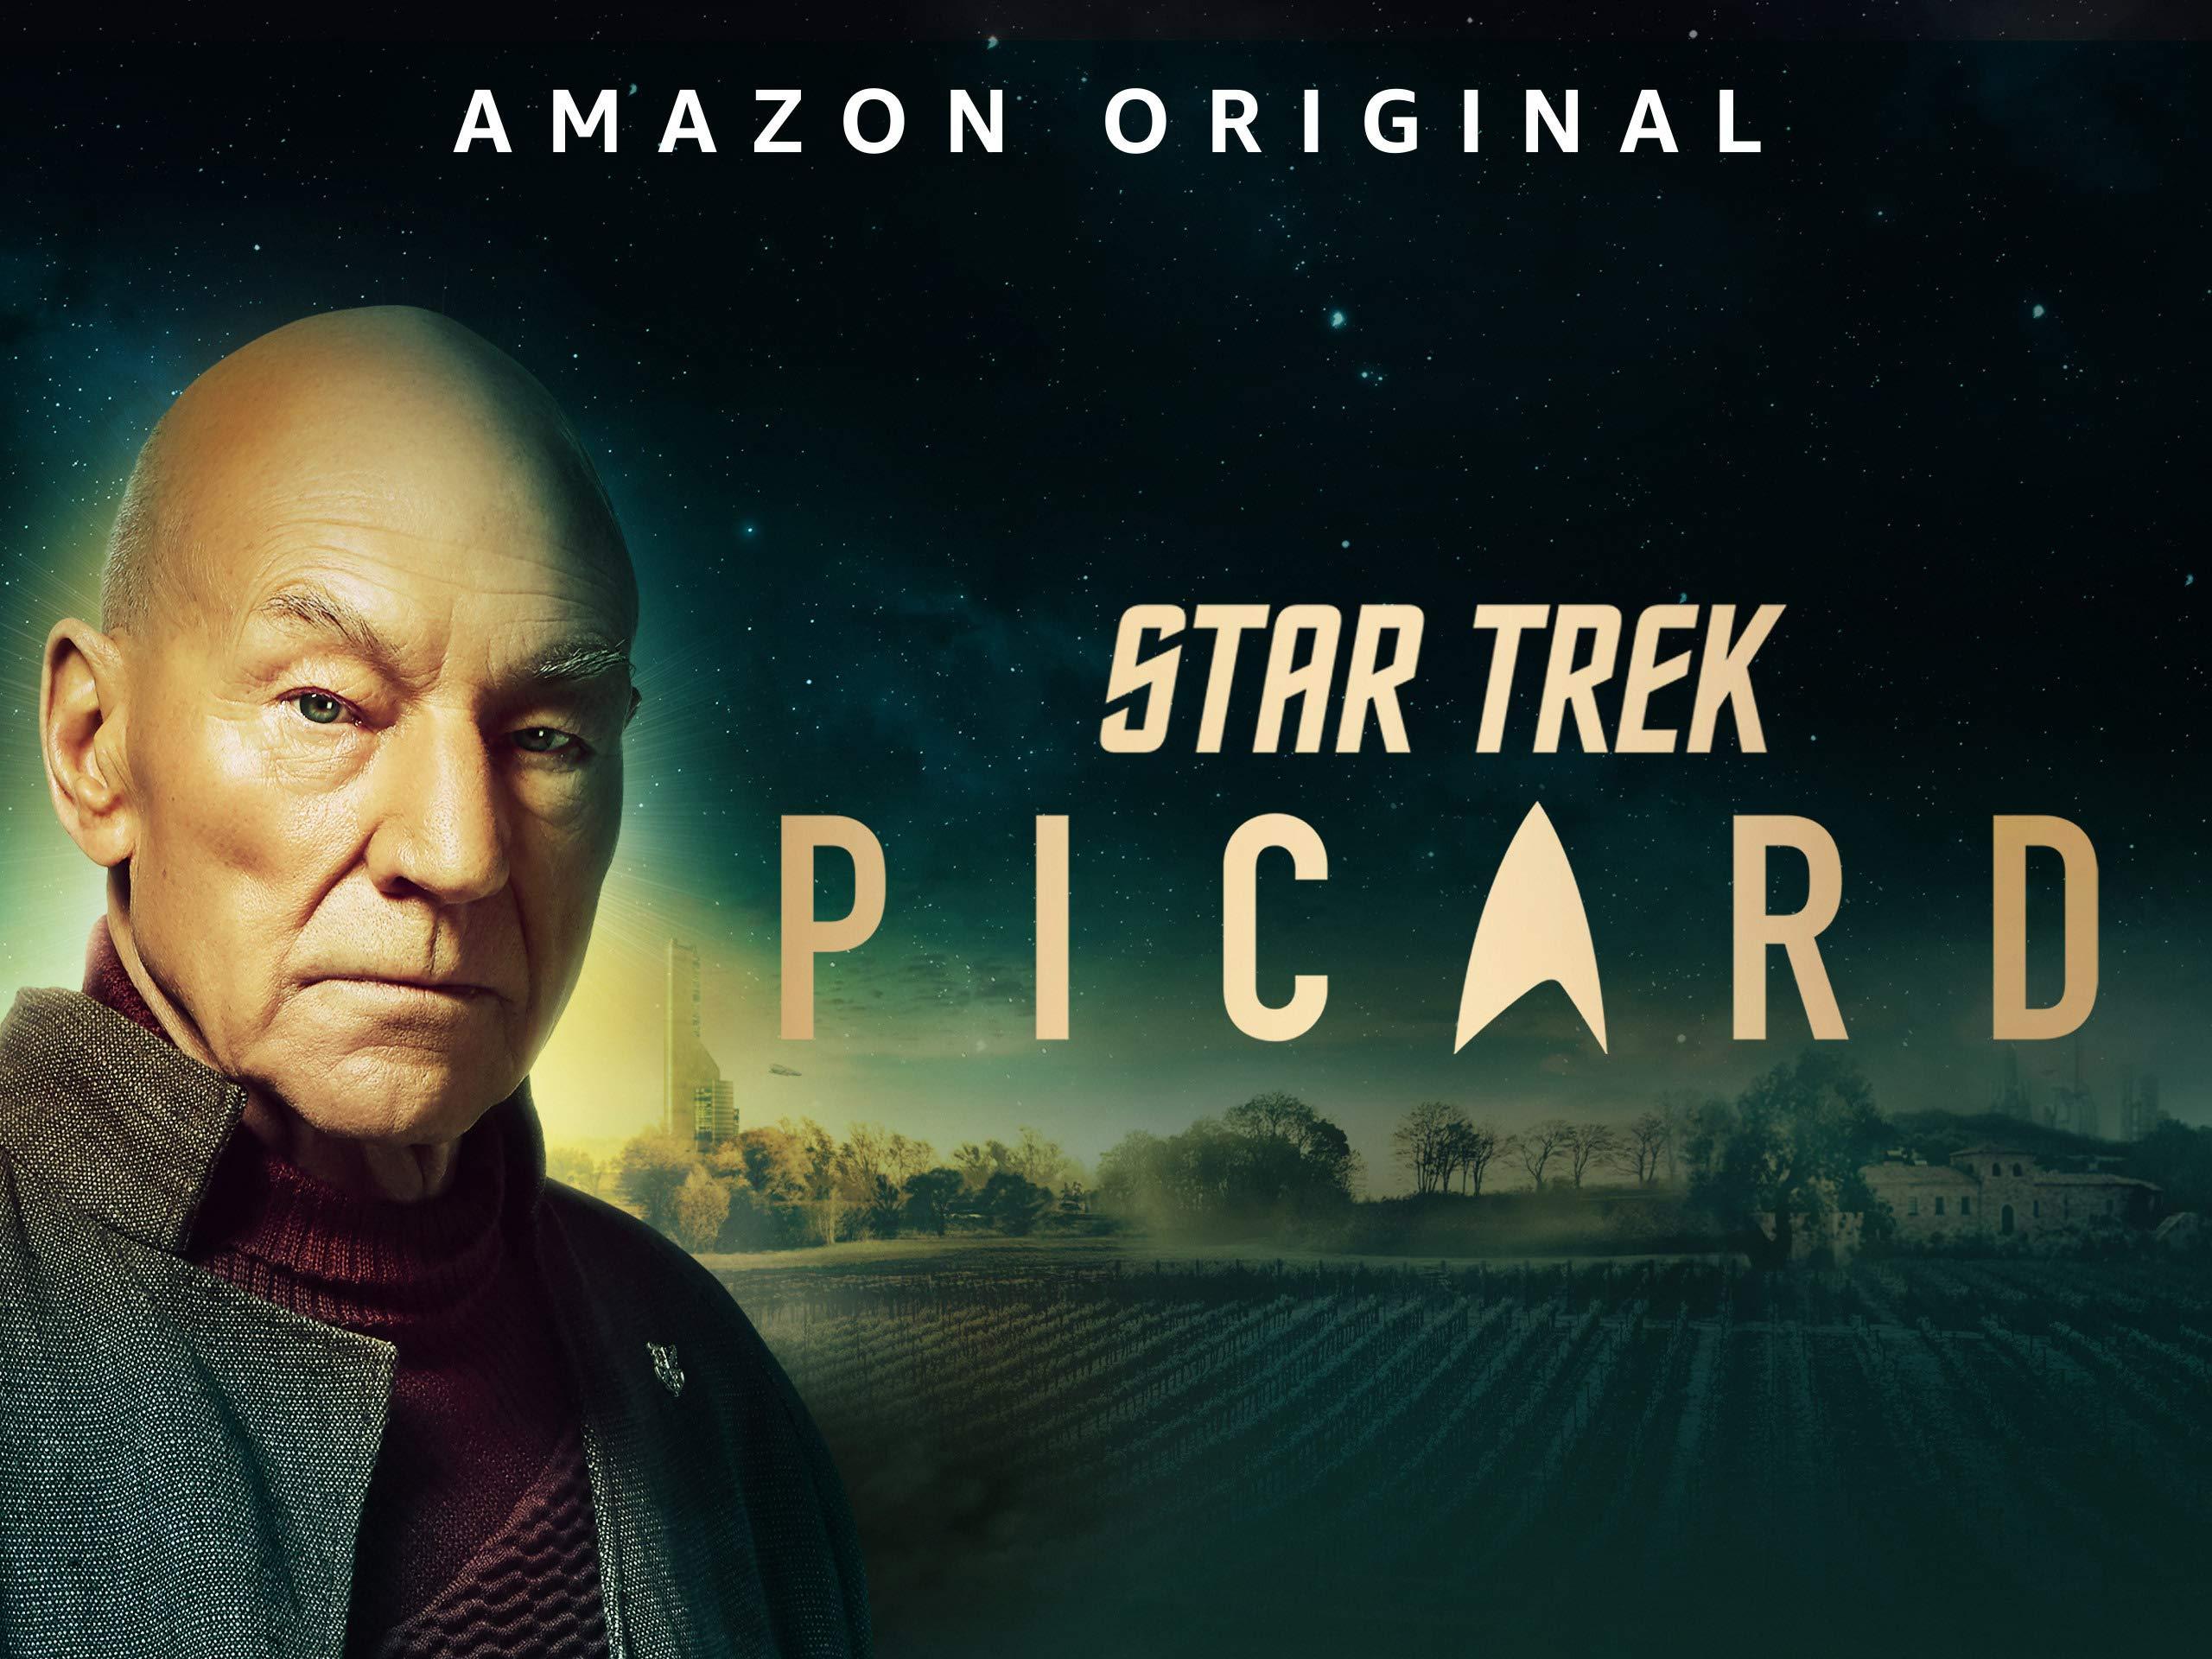 Star Trek: Picard: This Adversary Returns in Season 2